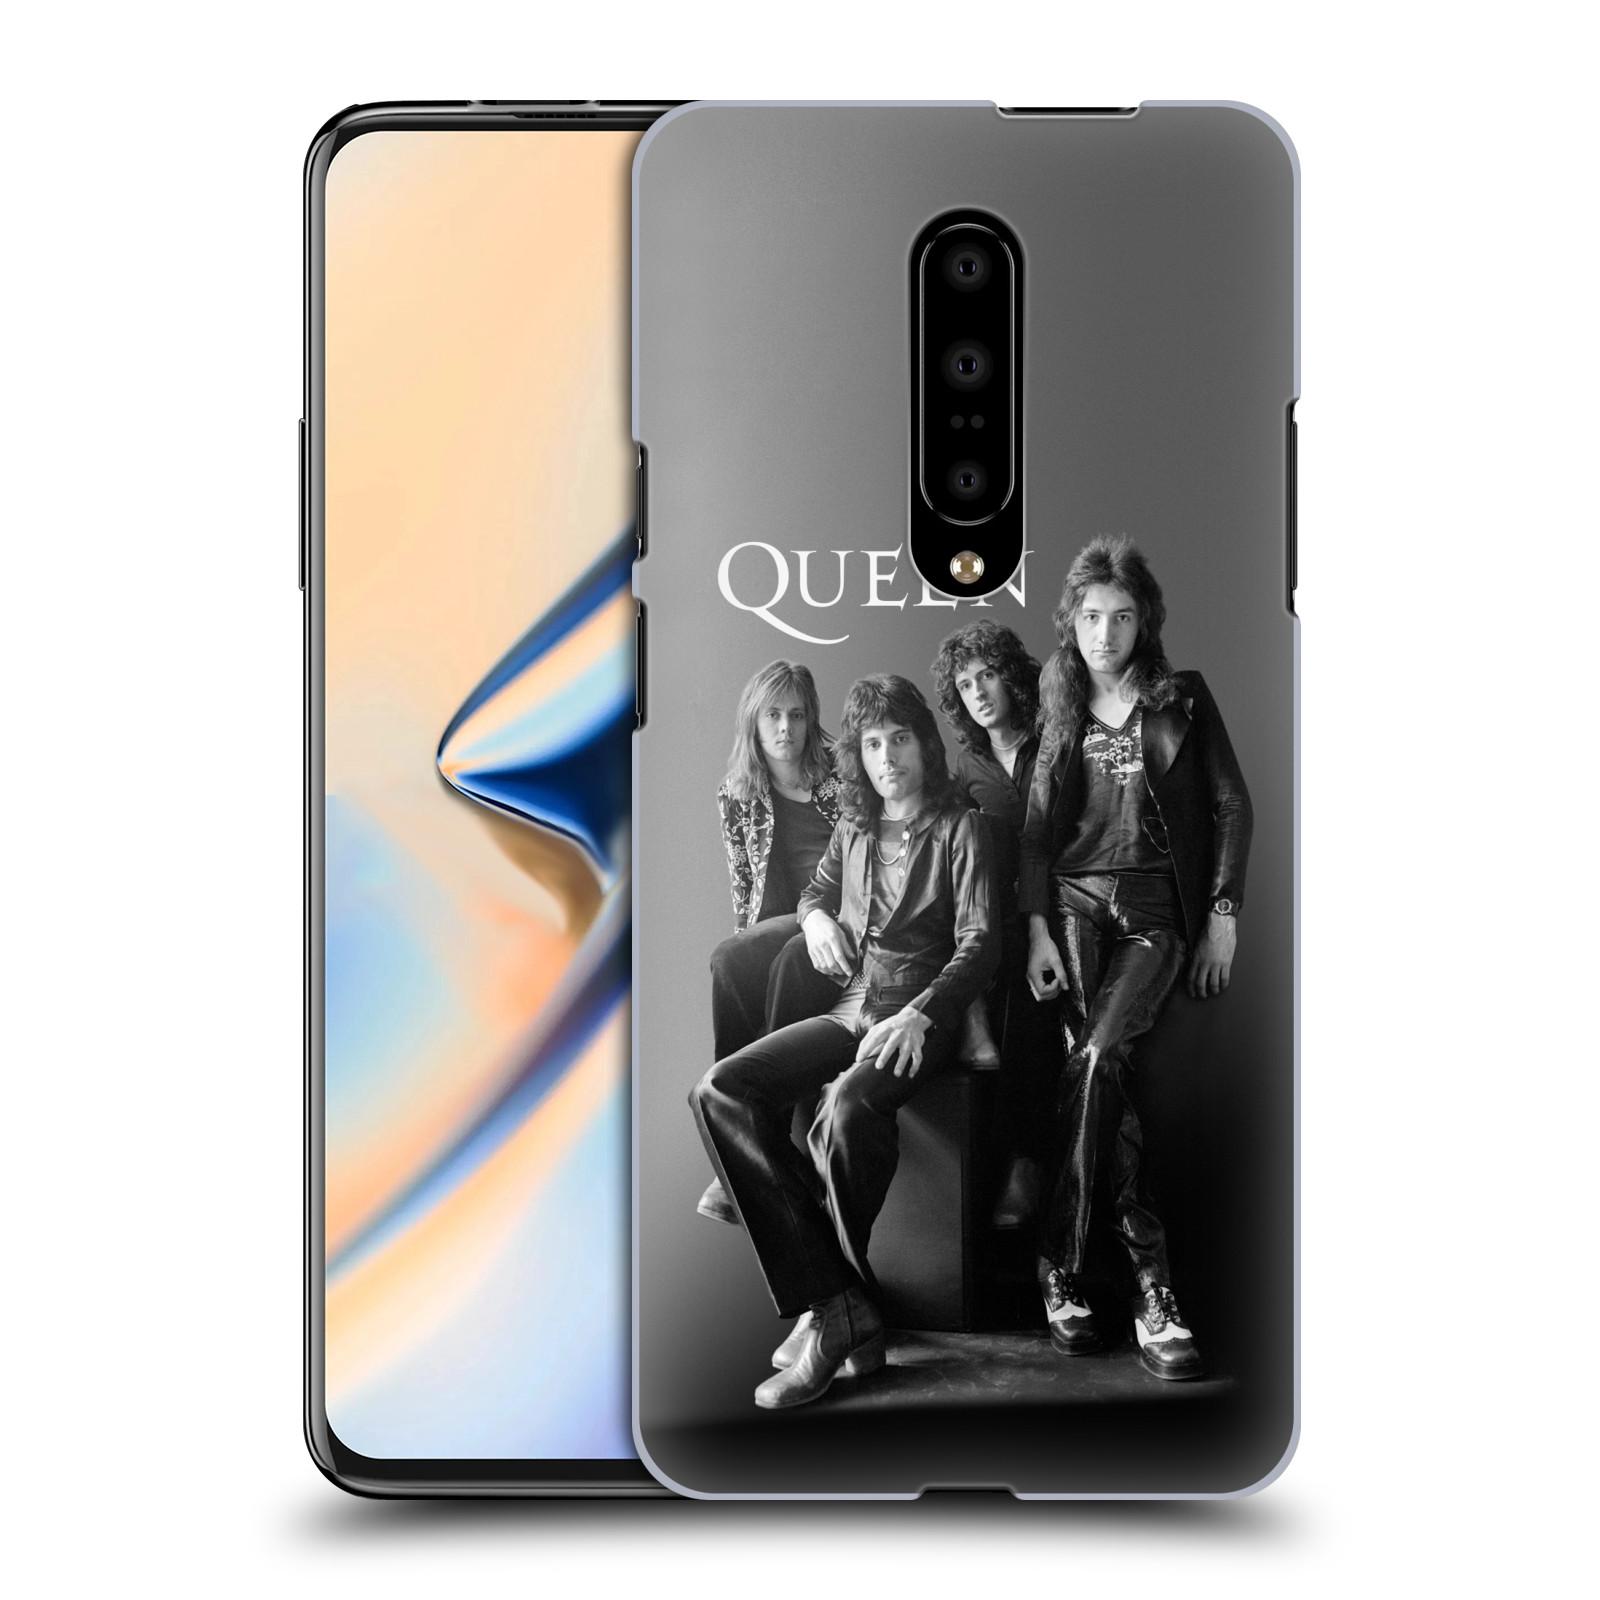 Plastové pouzdro na mobil OnePlus 7 - Head Case - Queen - Skupina